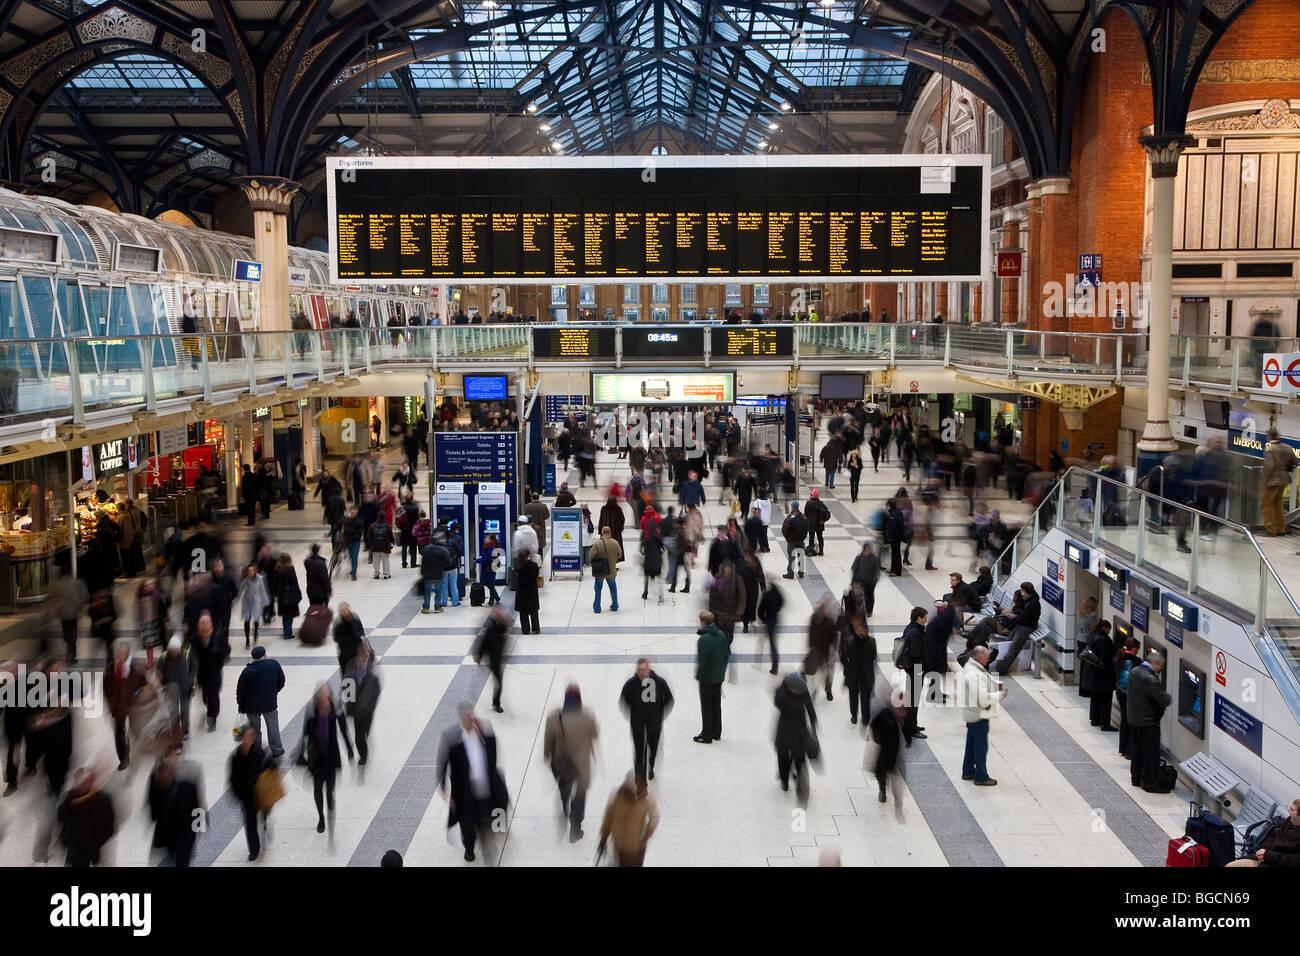 Liverpool Street Railway Station at morning rush hour, London, UK - Stock Image